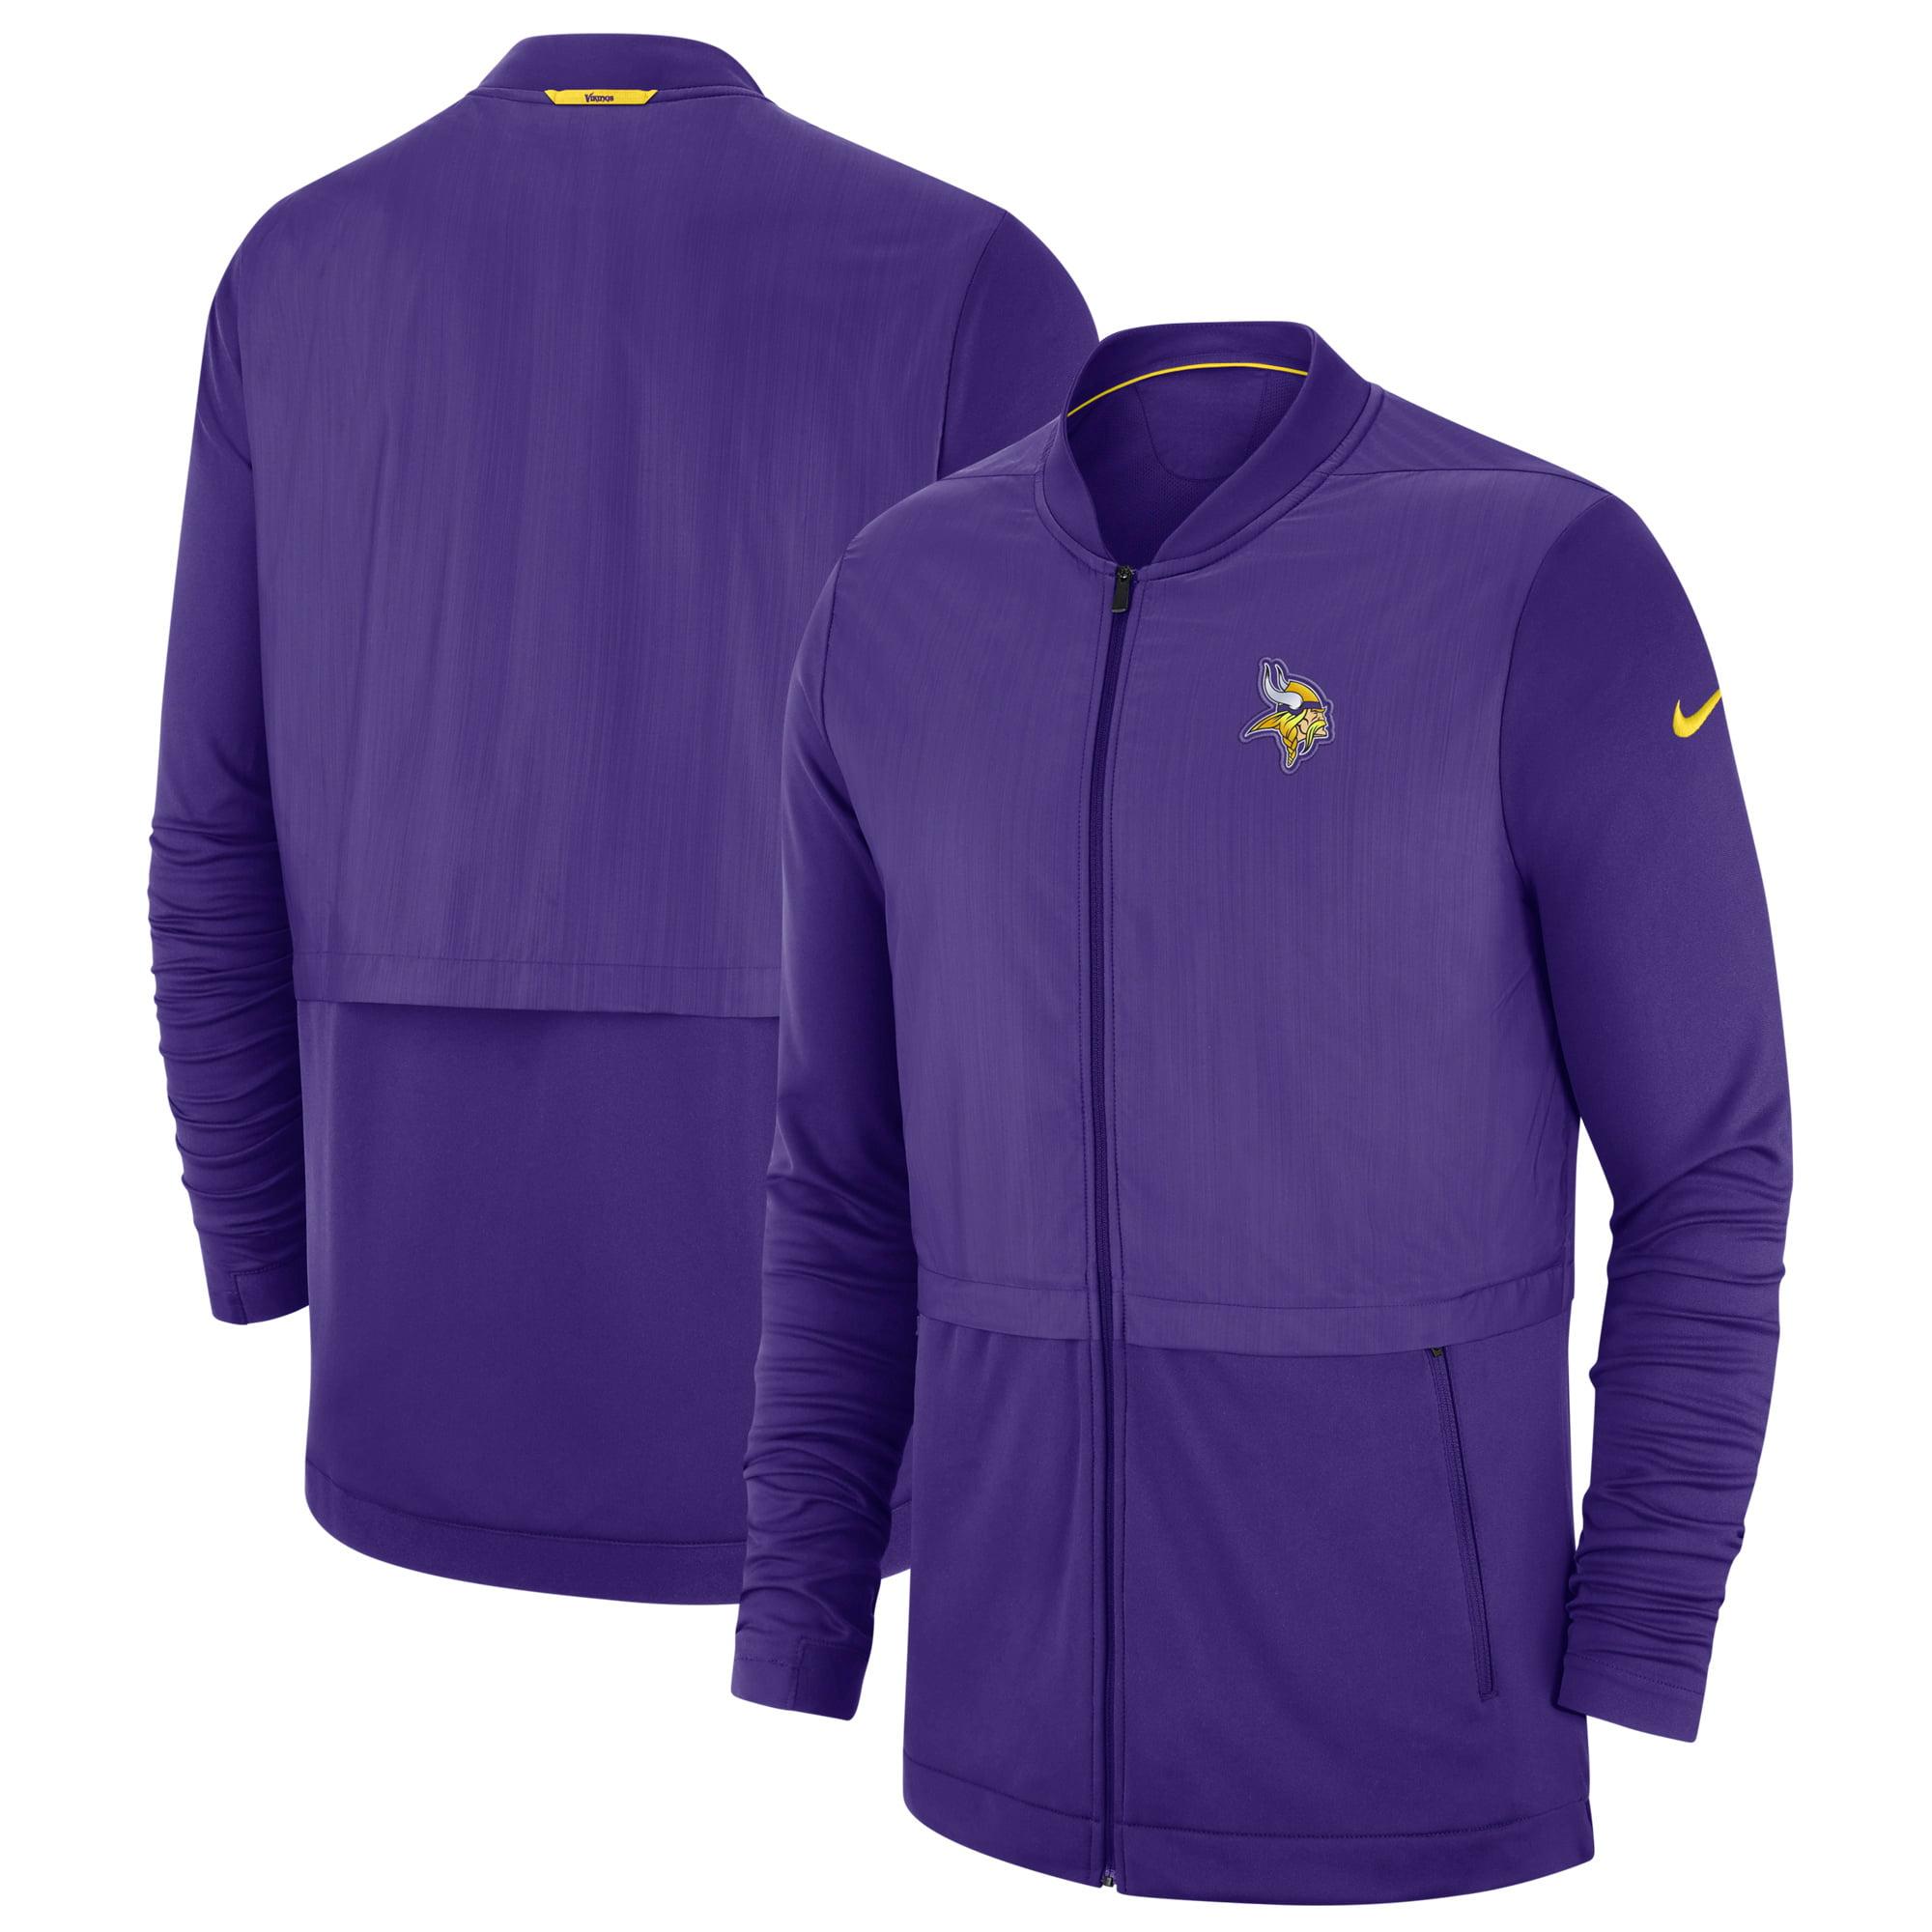 online store f6ada 63fb9 Minnesota Vikings Nike Sideline Elite Hybrid Full-Zip Jacket - Purple